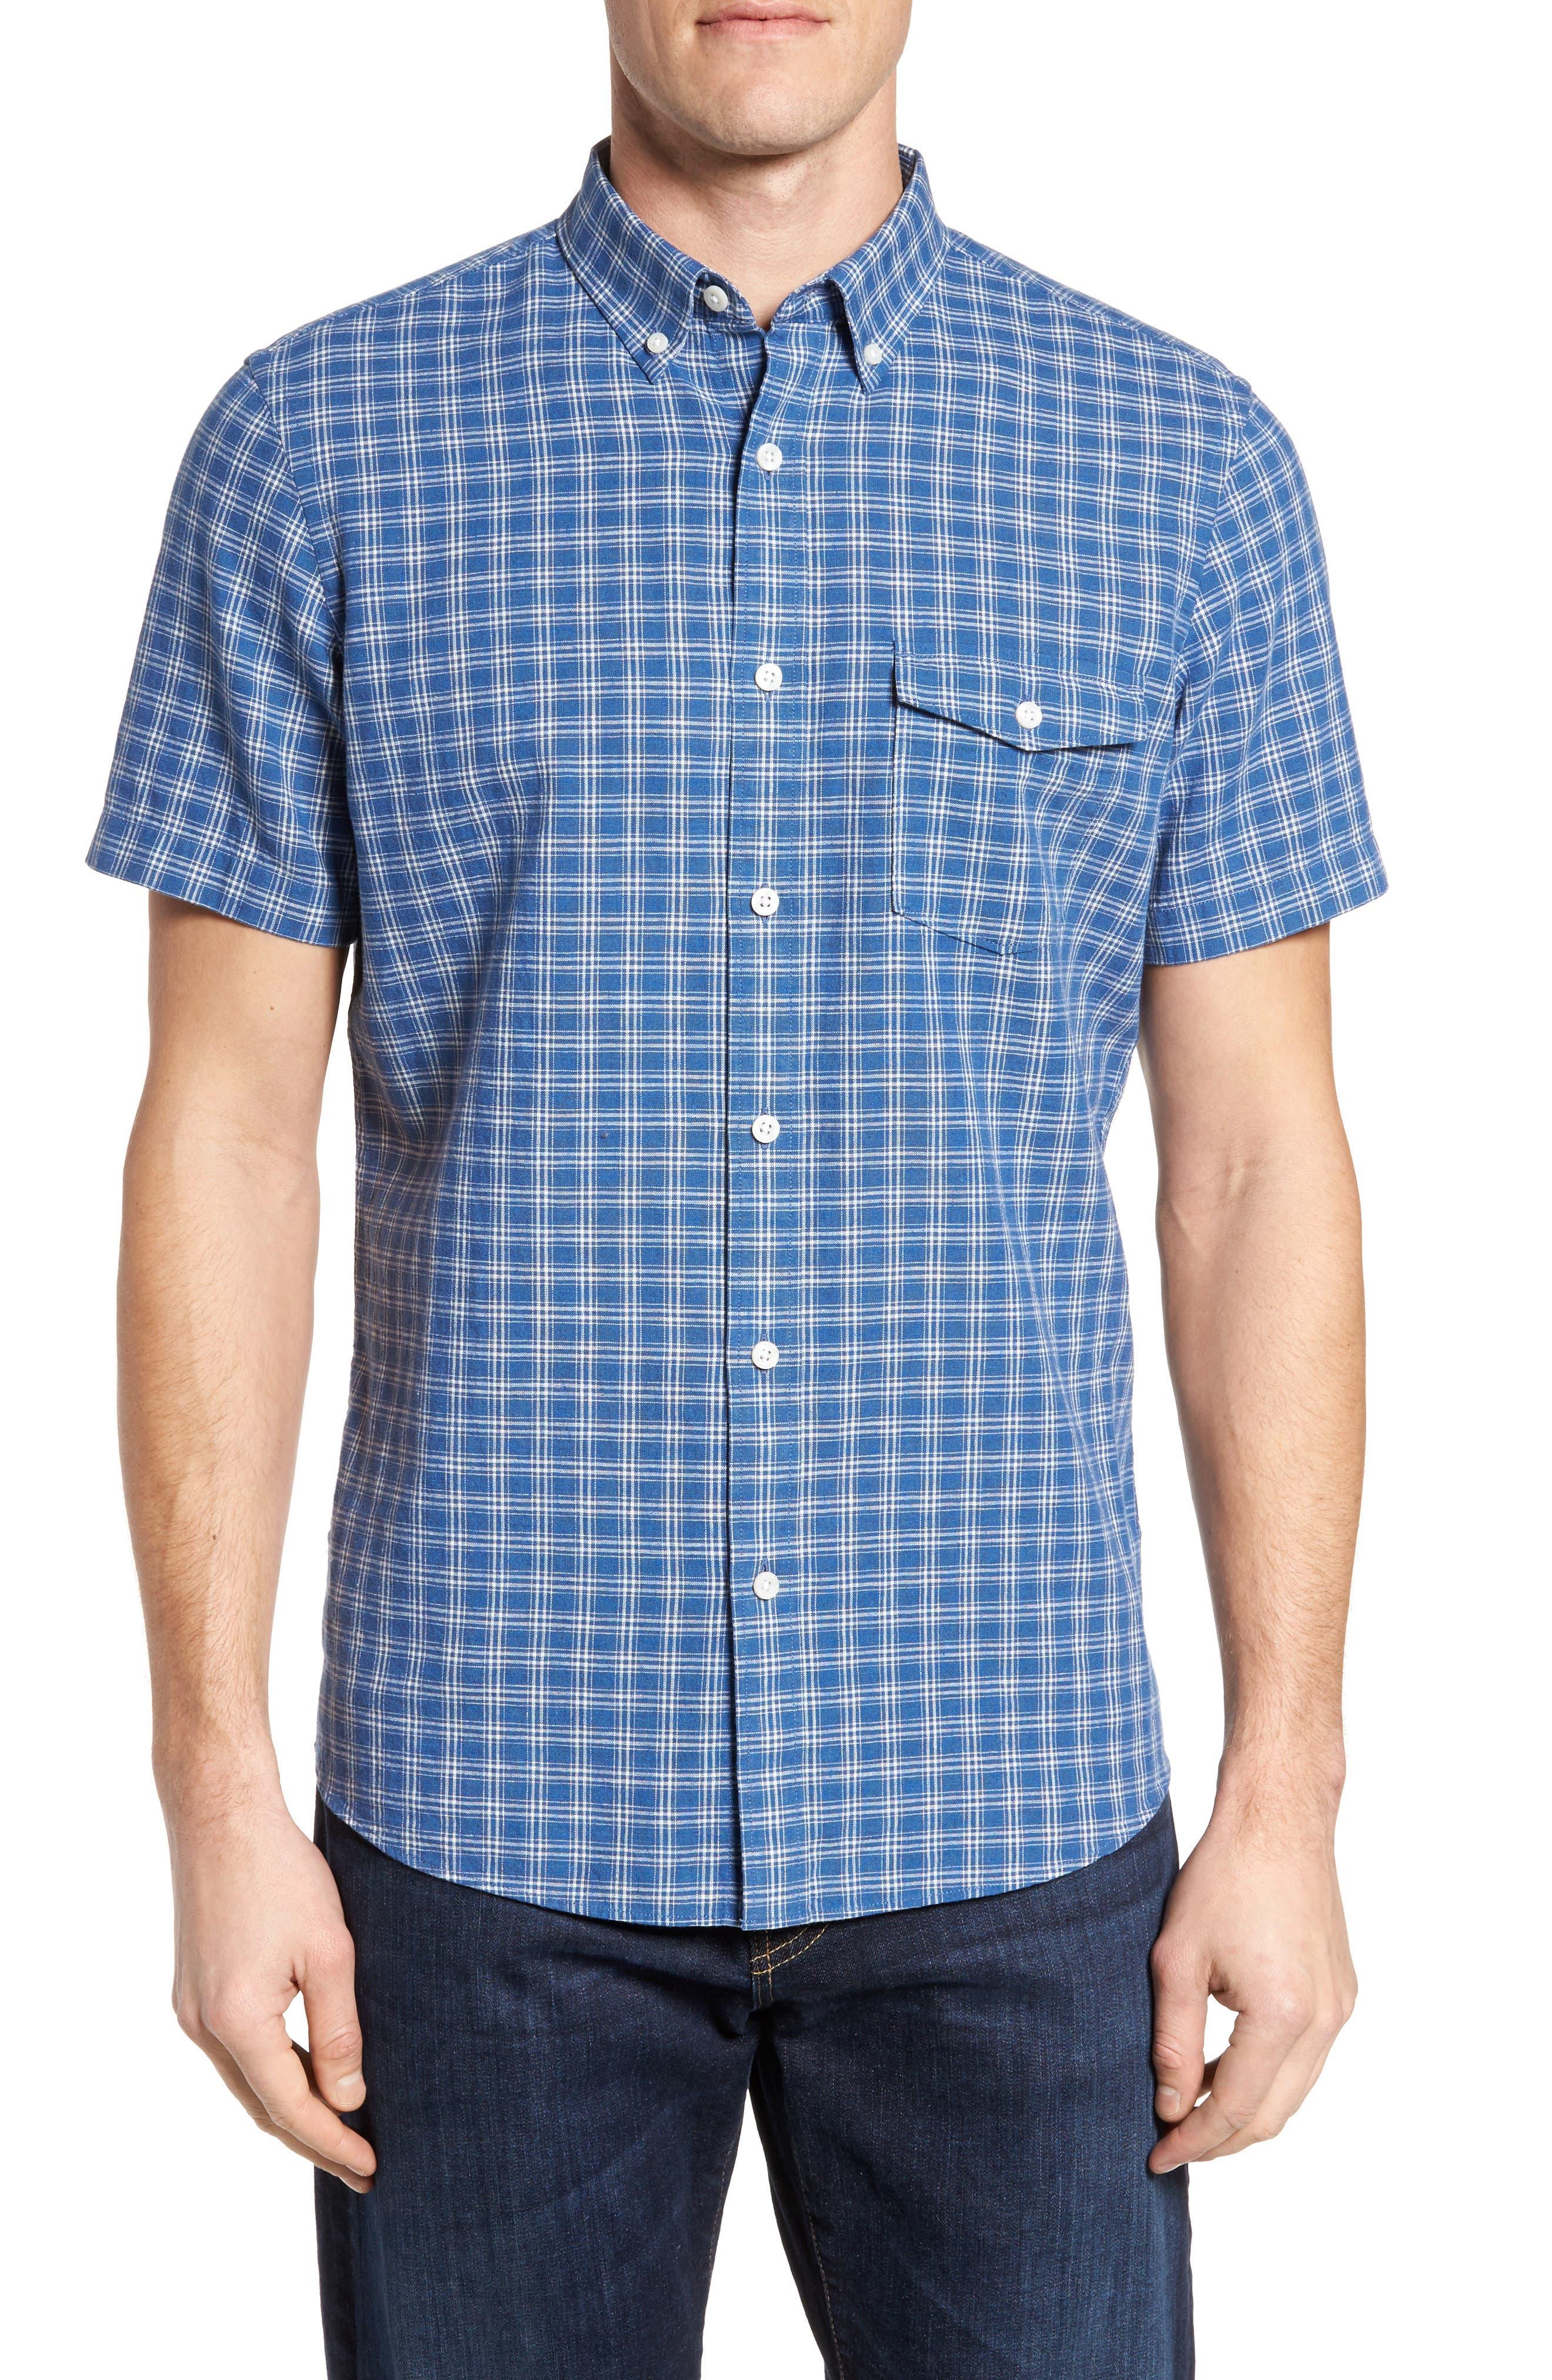 Ivy Trim Fit Check Sport Shirt,                             Main thumbnail 1, color,                             Blue Indigo White Plaid